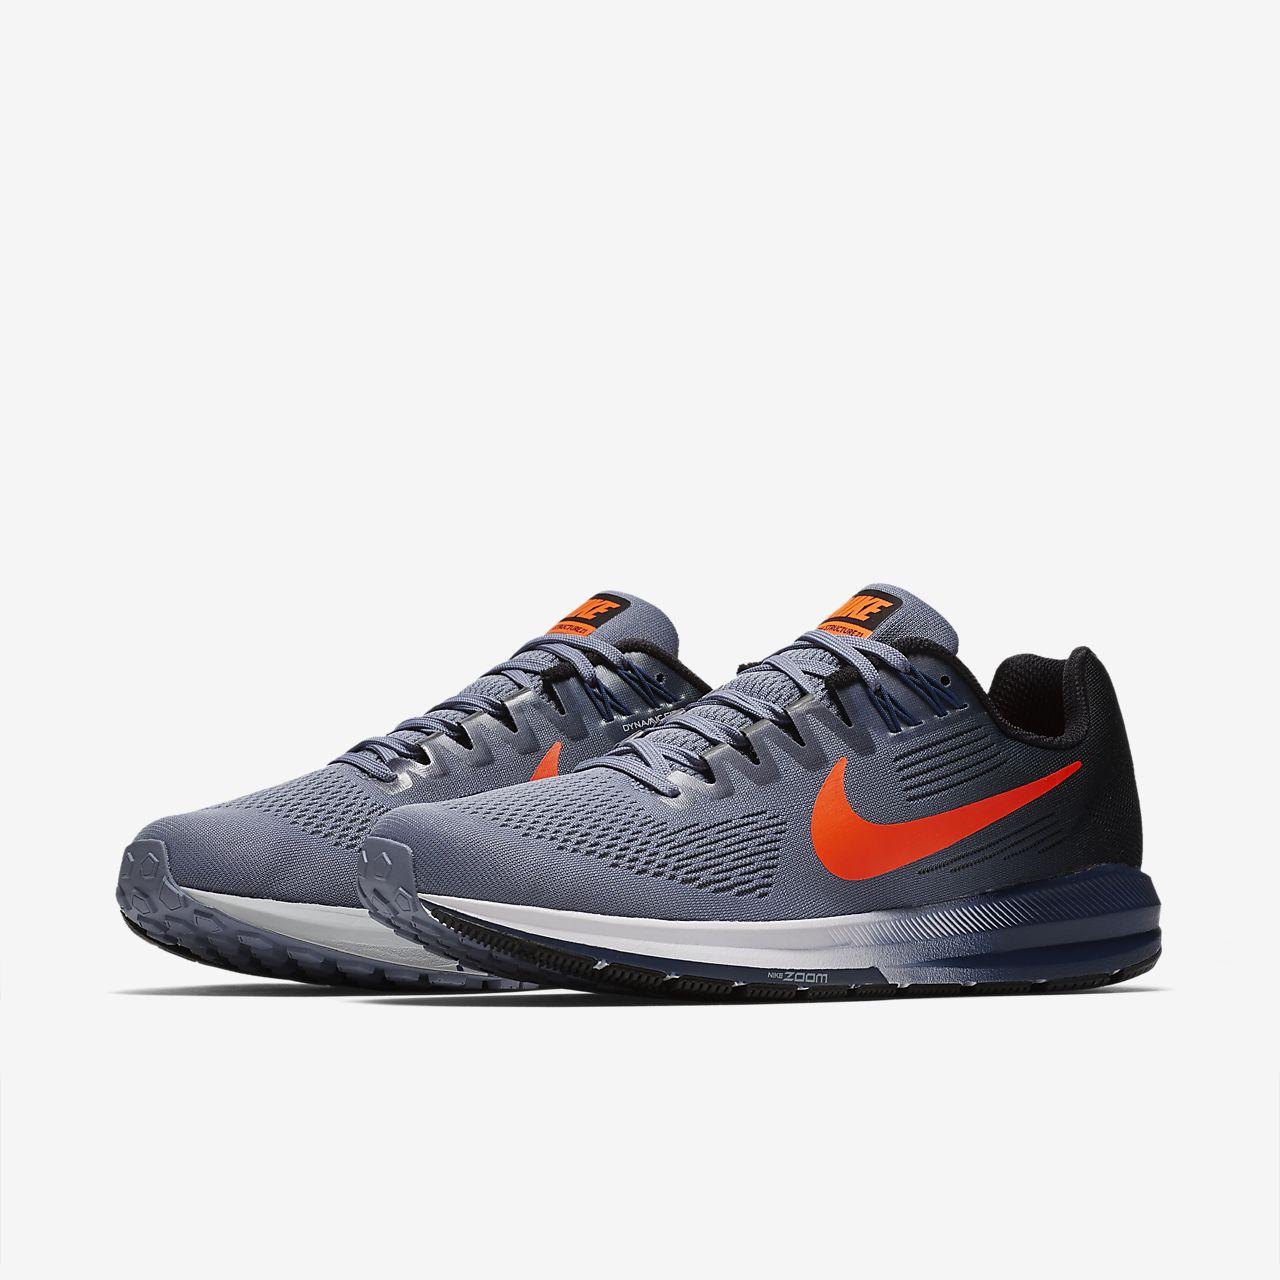 Nike PerformanceAIR ZOOM STRUCTURE 21 - Stabilty running shoes - blue/white/gym blue uvPJJuyZ